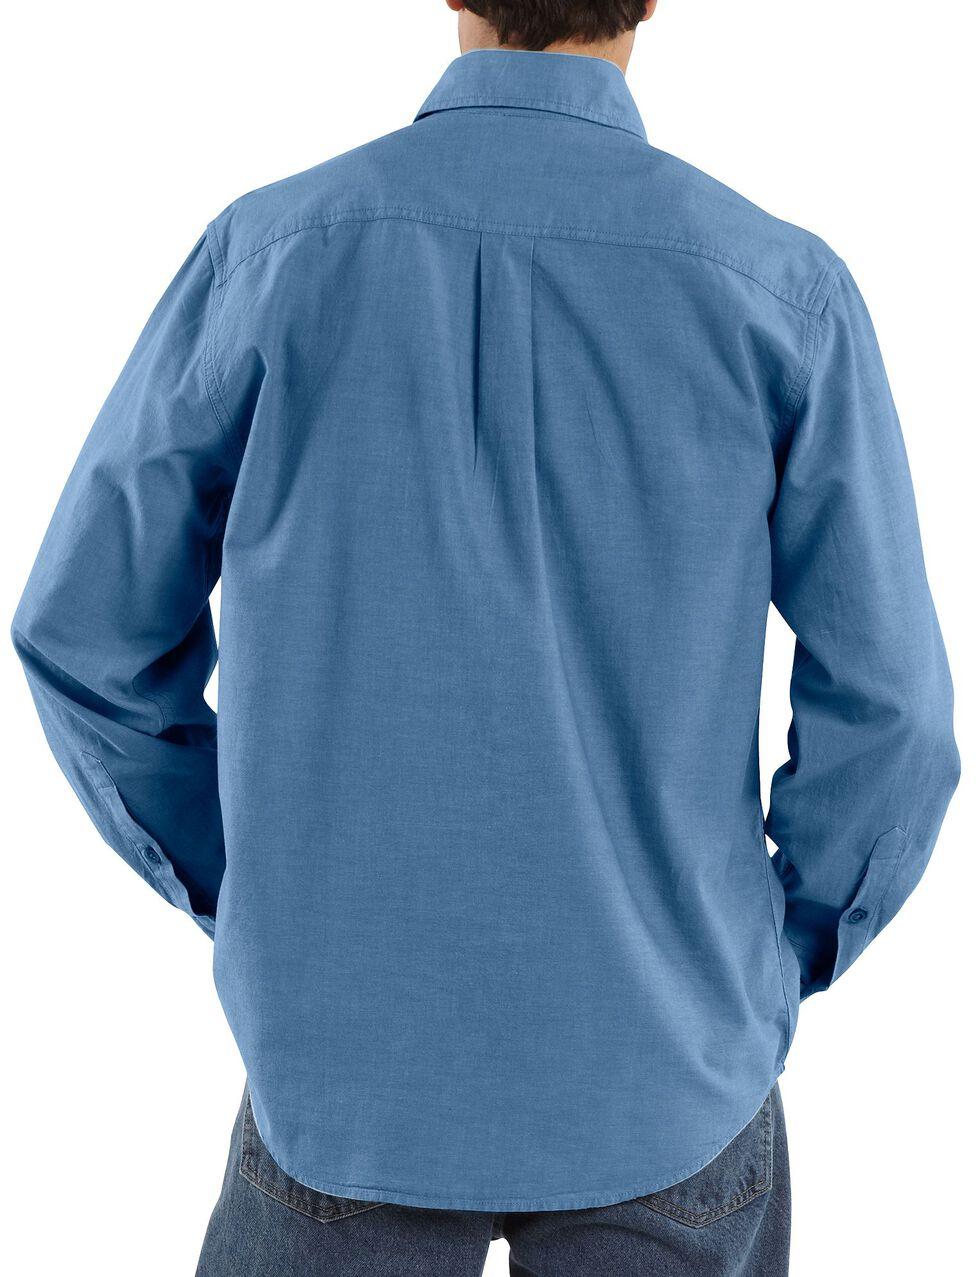 Carhartt Fort Long Sleeve Work Shirt - Big & Tall, Chambray, hi-res